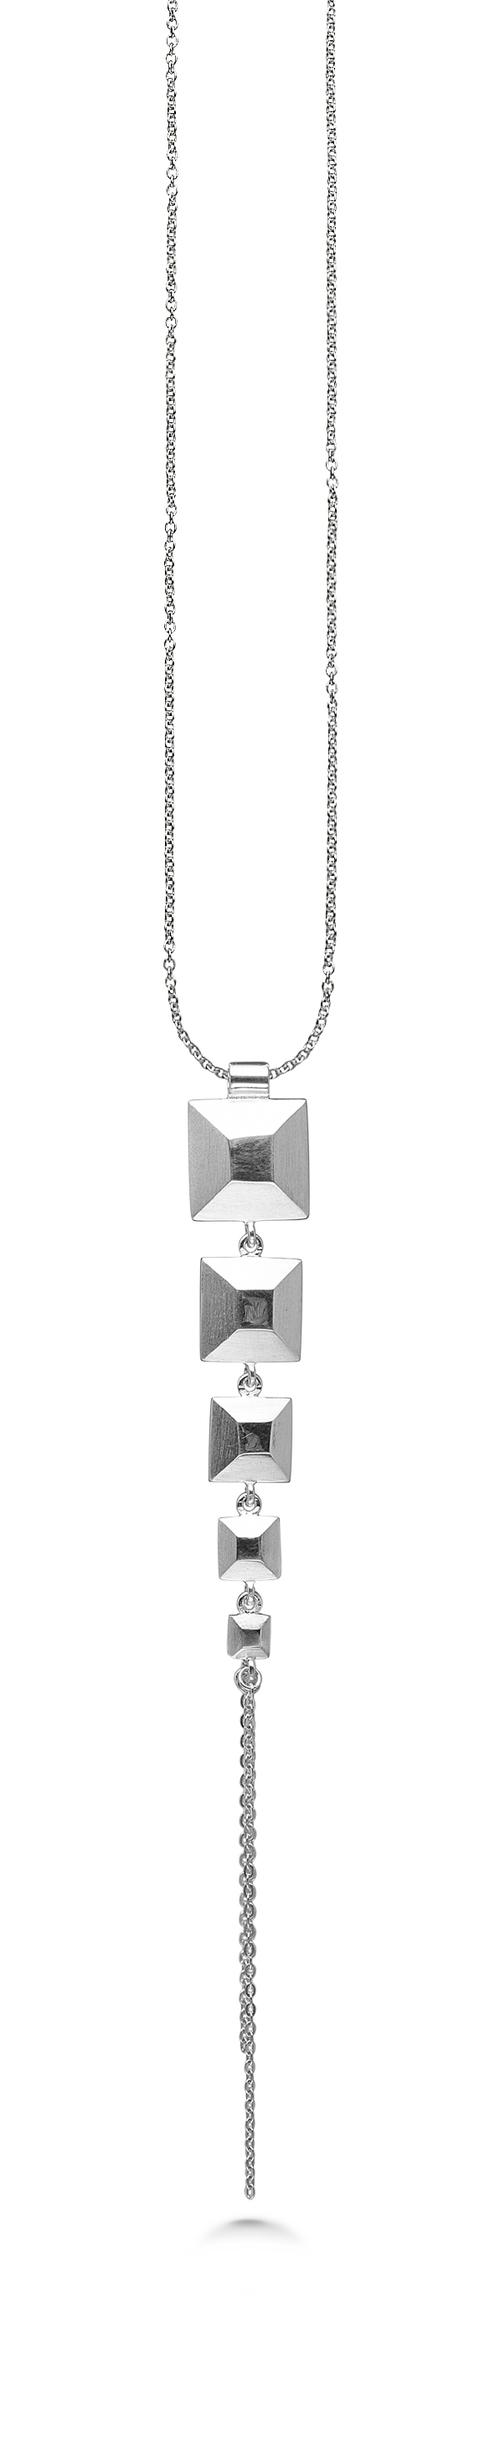 Kranz & Ziegler Sølv halssmykke squares - 4003791-45